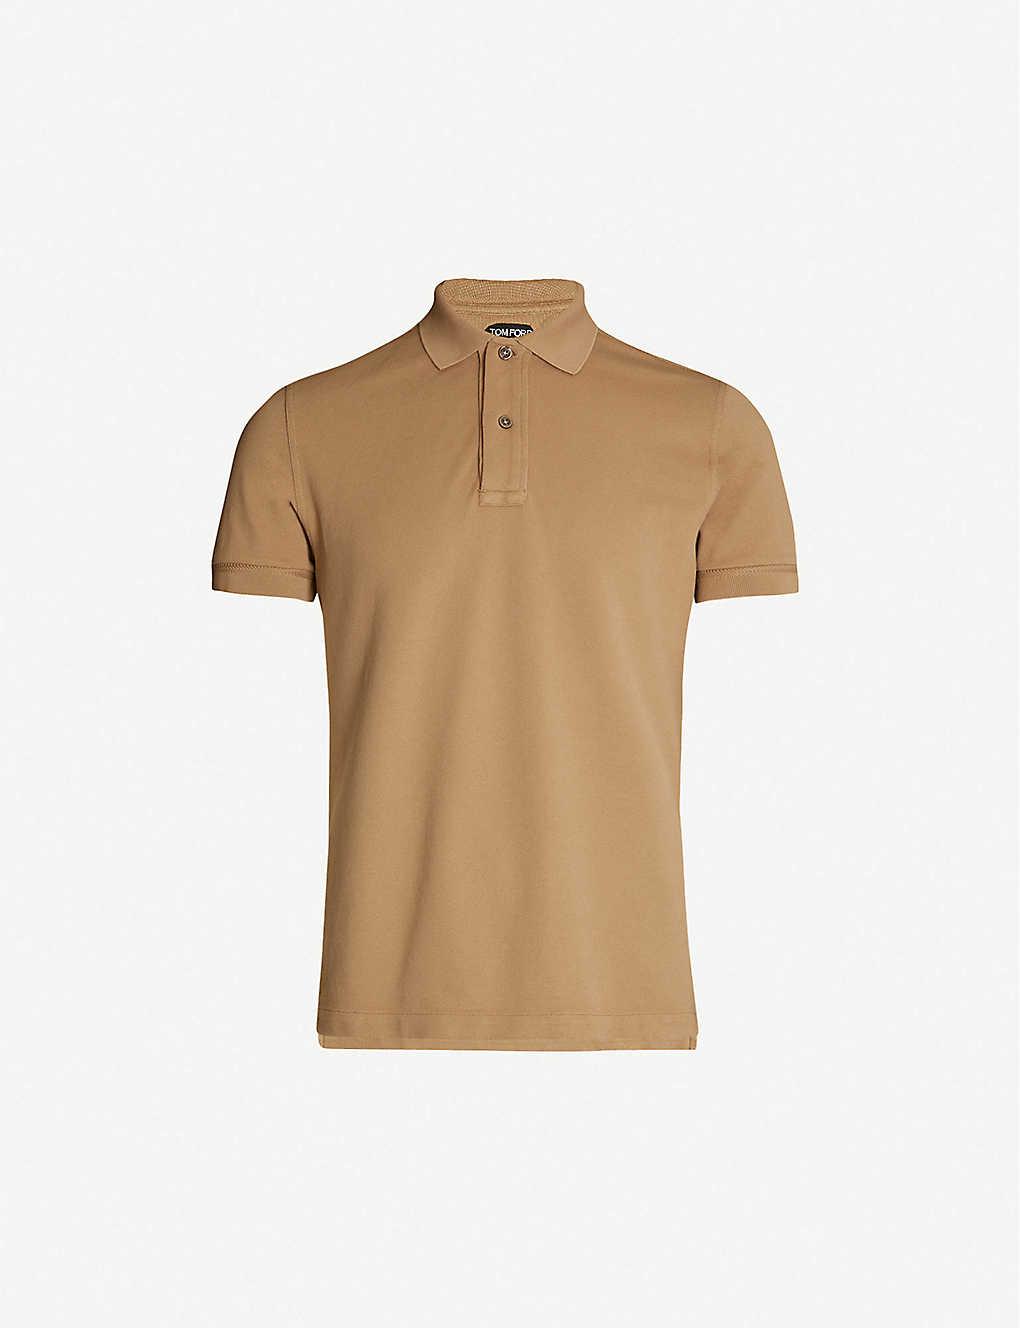 ad83bdbf95086 TOM FORD - Button-up cotton-piqué polo shirt   Selfridges.com